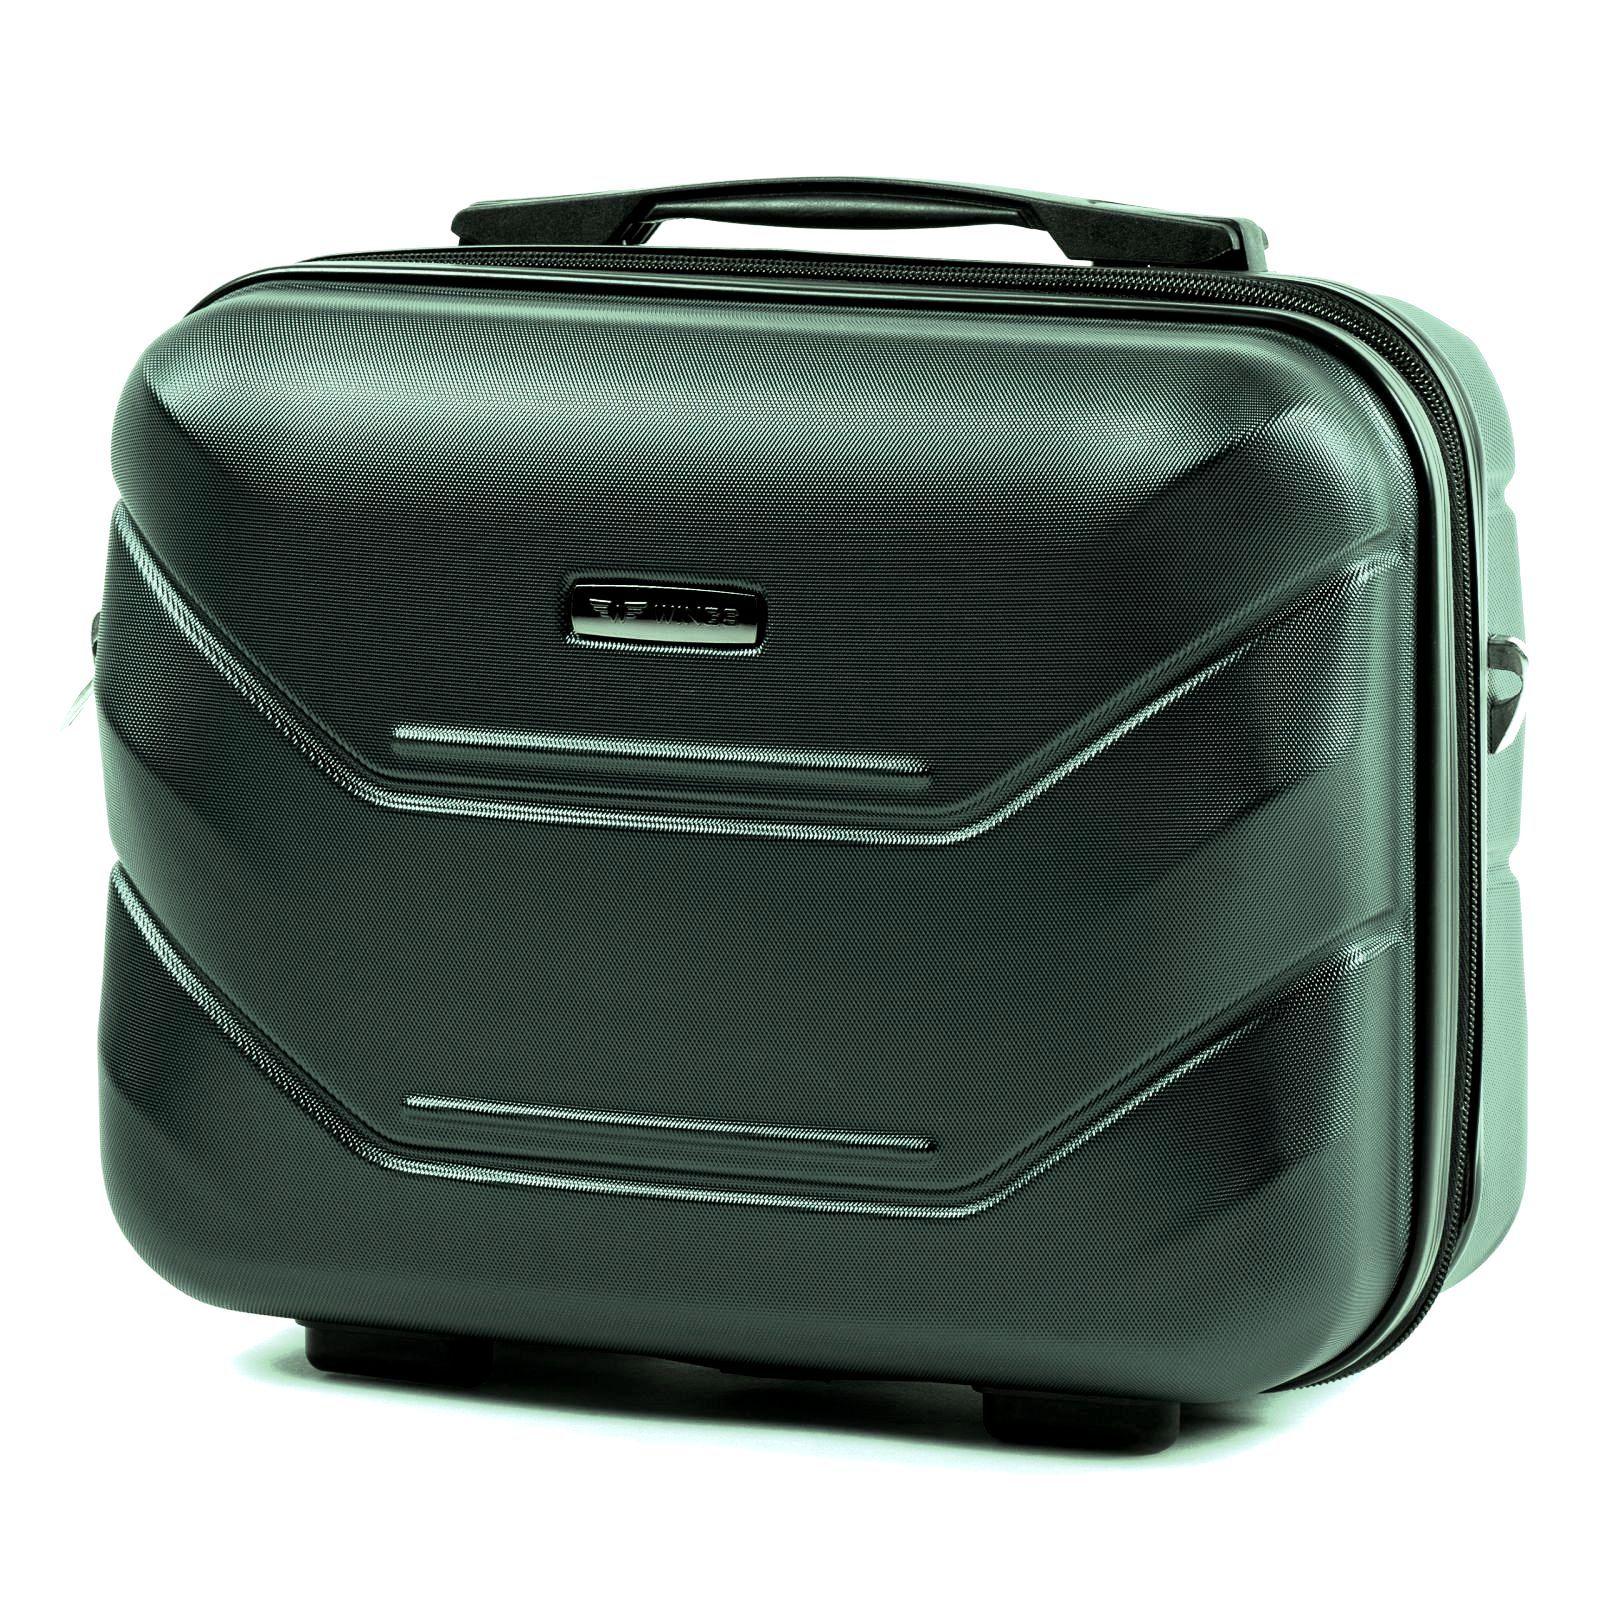 Kosmetický kufřík WINGS 147 ABS DARK GREEN